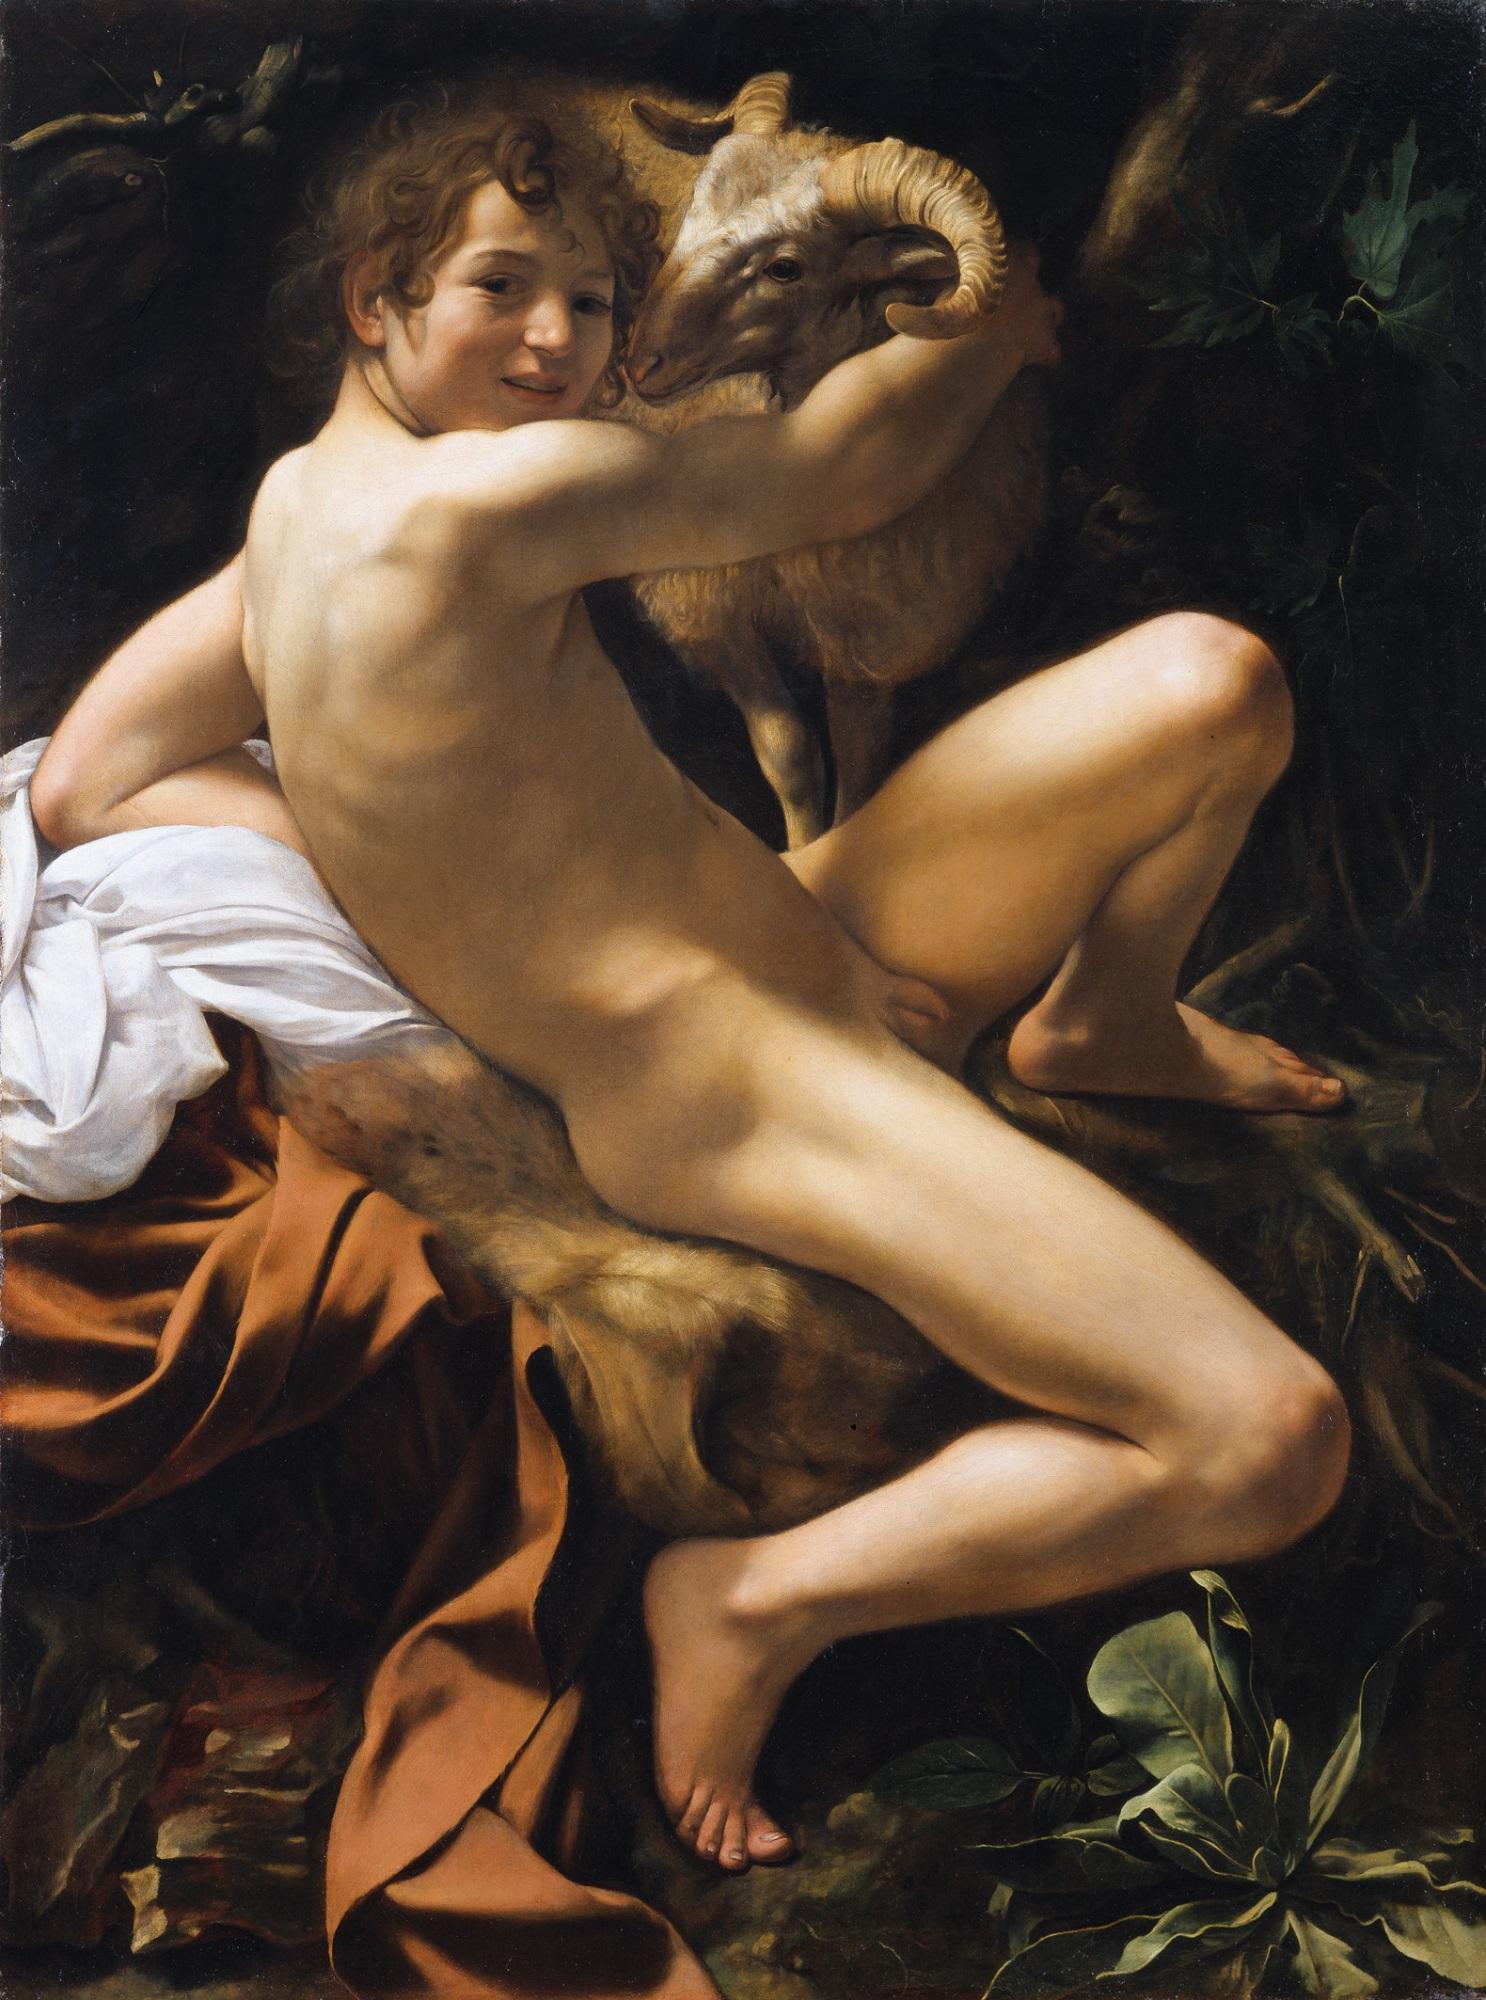 Michelangelo Merisi da Caravaggio, 'St John the Baptist' Rome, c. 1602 Canvas, 129 × 95 cm Rome, Musei Capitolini, Pinacoteca Capitolina © Sovrintendenza Capitolina, Musei Capitolini – Pinacoteca Capitolina, Roma